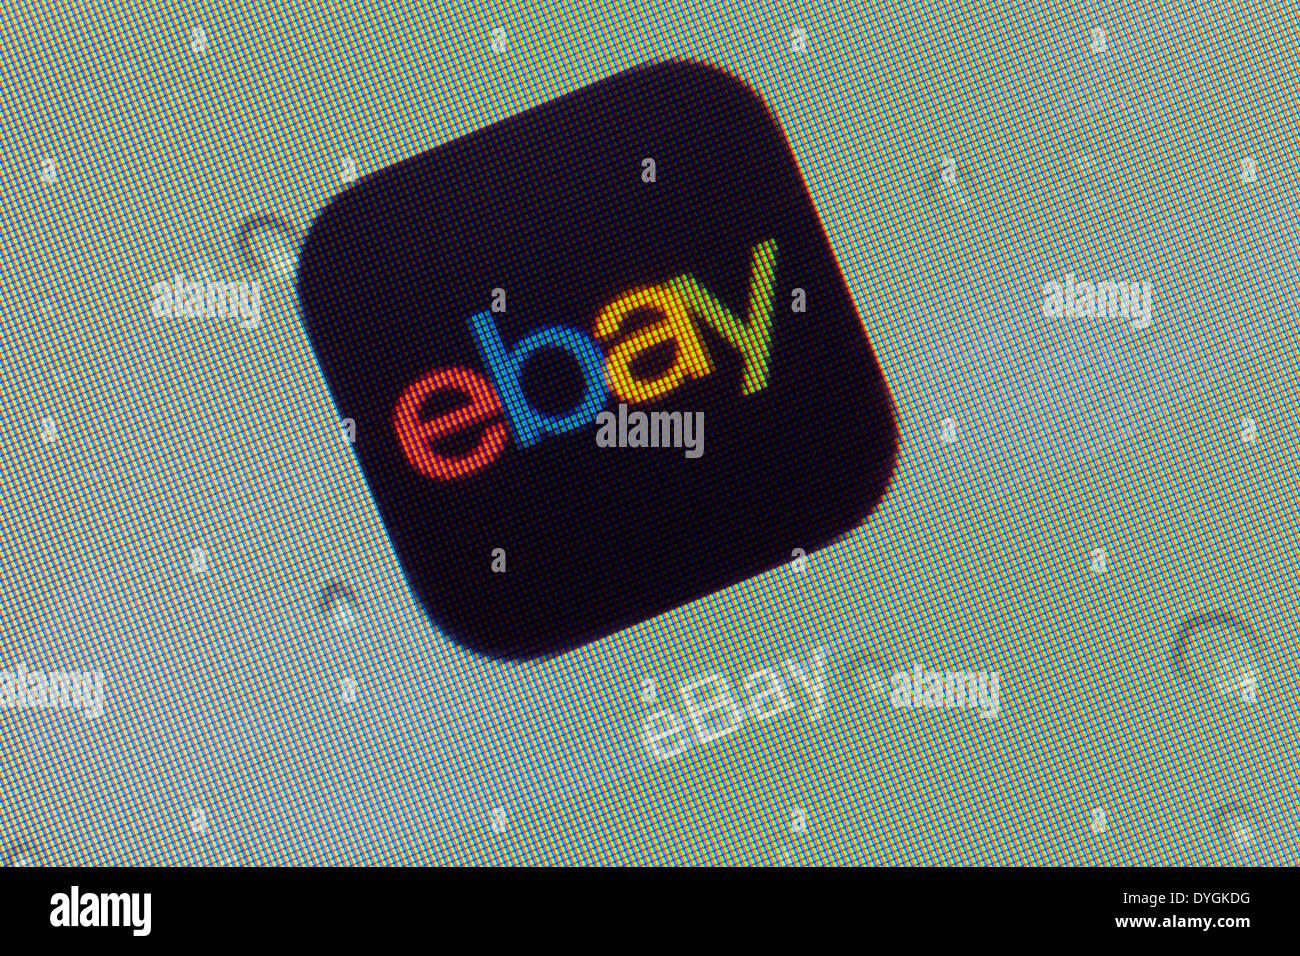 Ebay logo app icon on iPad apps logos icons - Stock Image